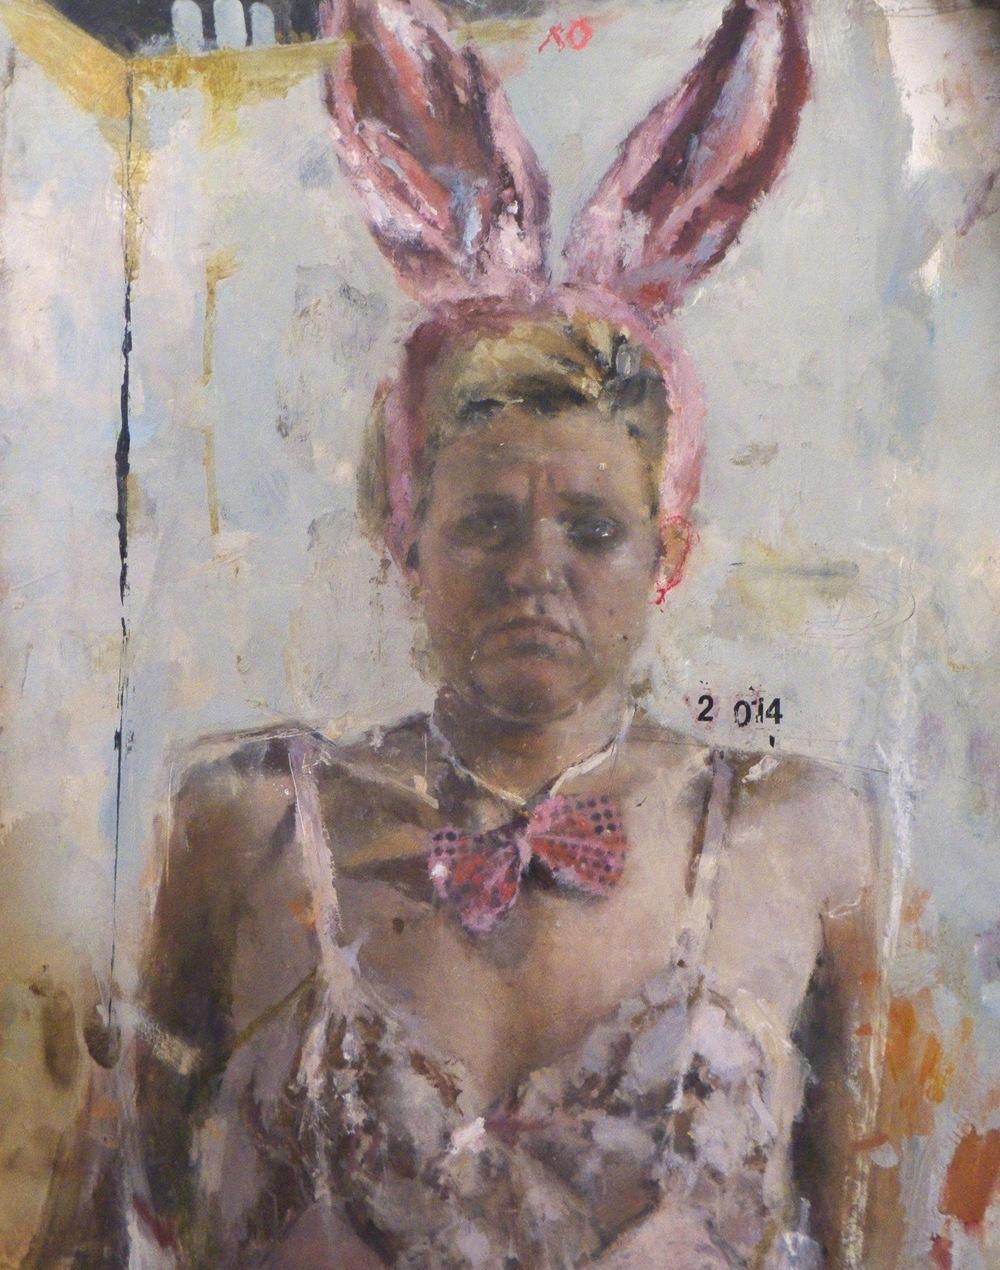 Playboy Self-Portrait